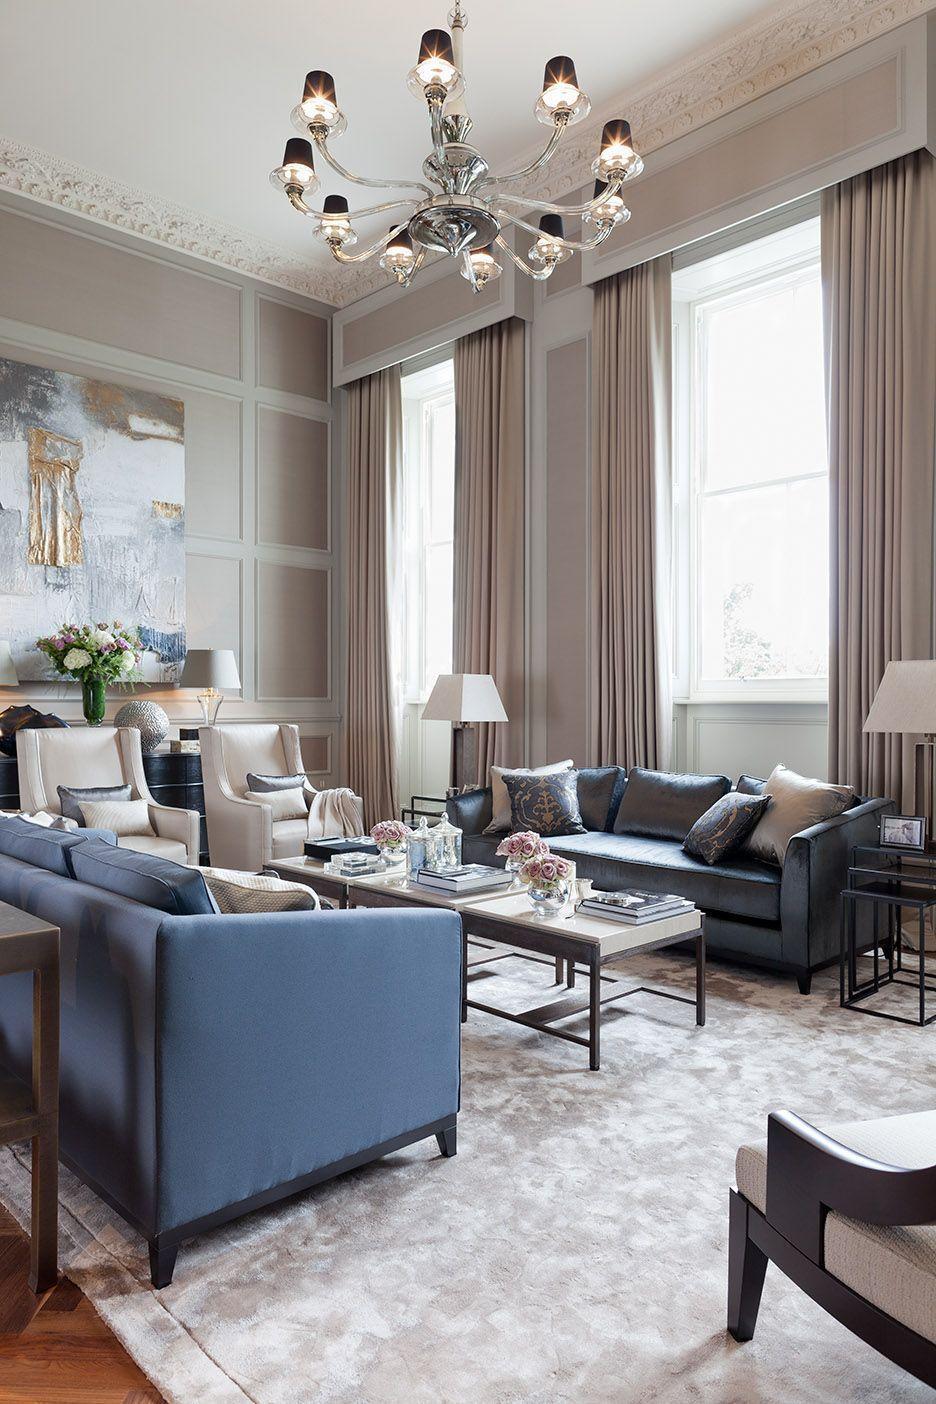 Usa Contemporary Home Decor And Mid Century Modern Lighting Ideas From Delightfull Http Www Deli Living Room Interior Home Design Decor Living Room Designs